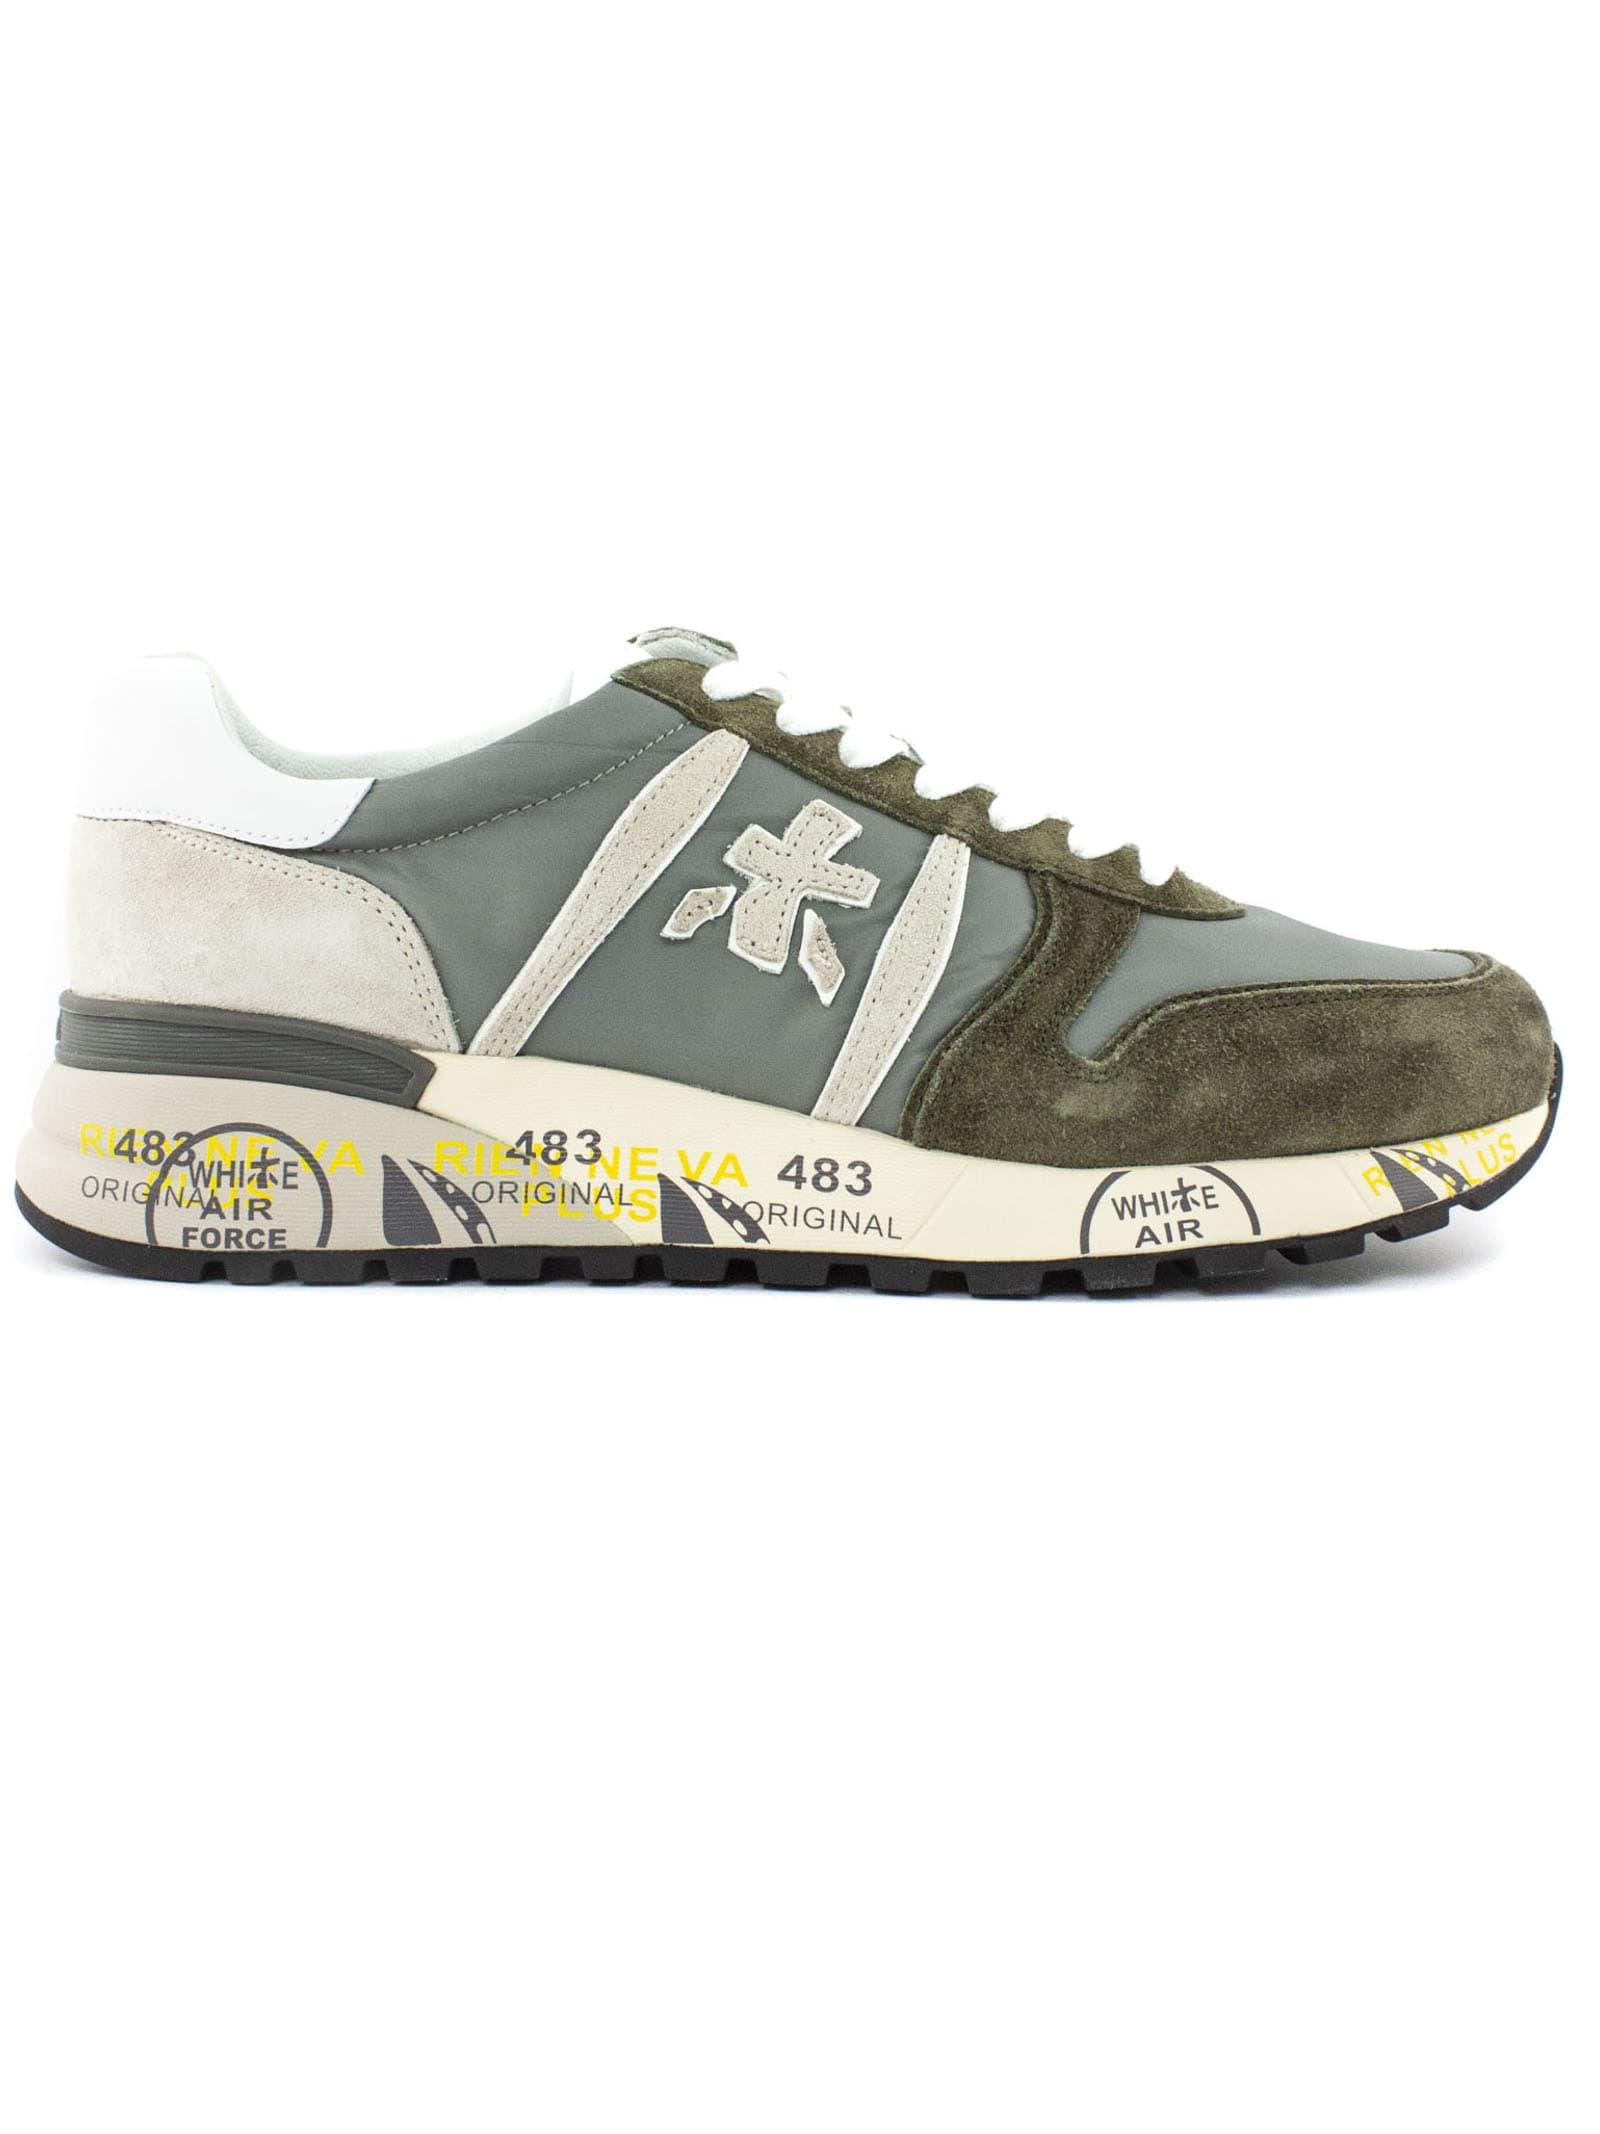 Premiata Shoes GREY LANDER SNEAKERS